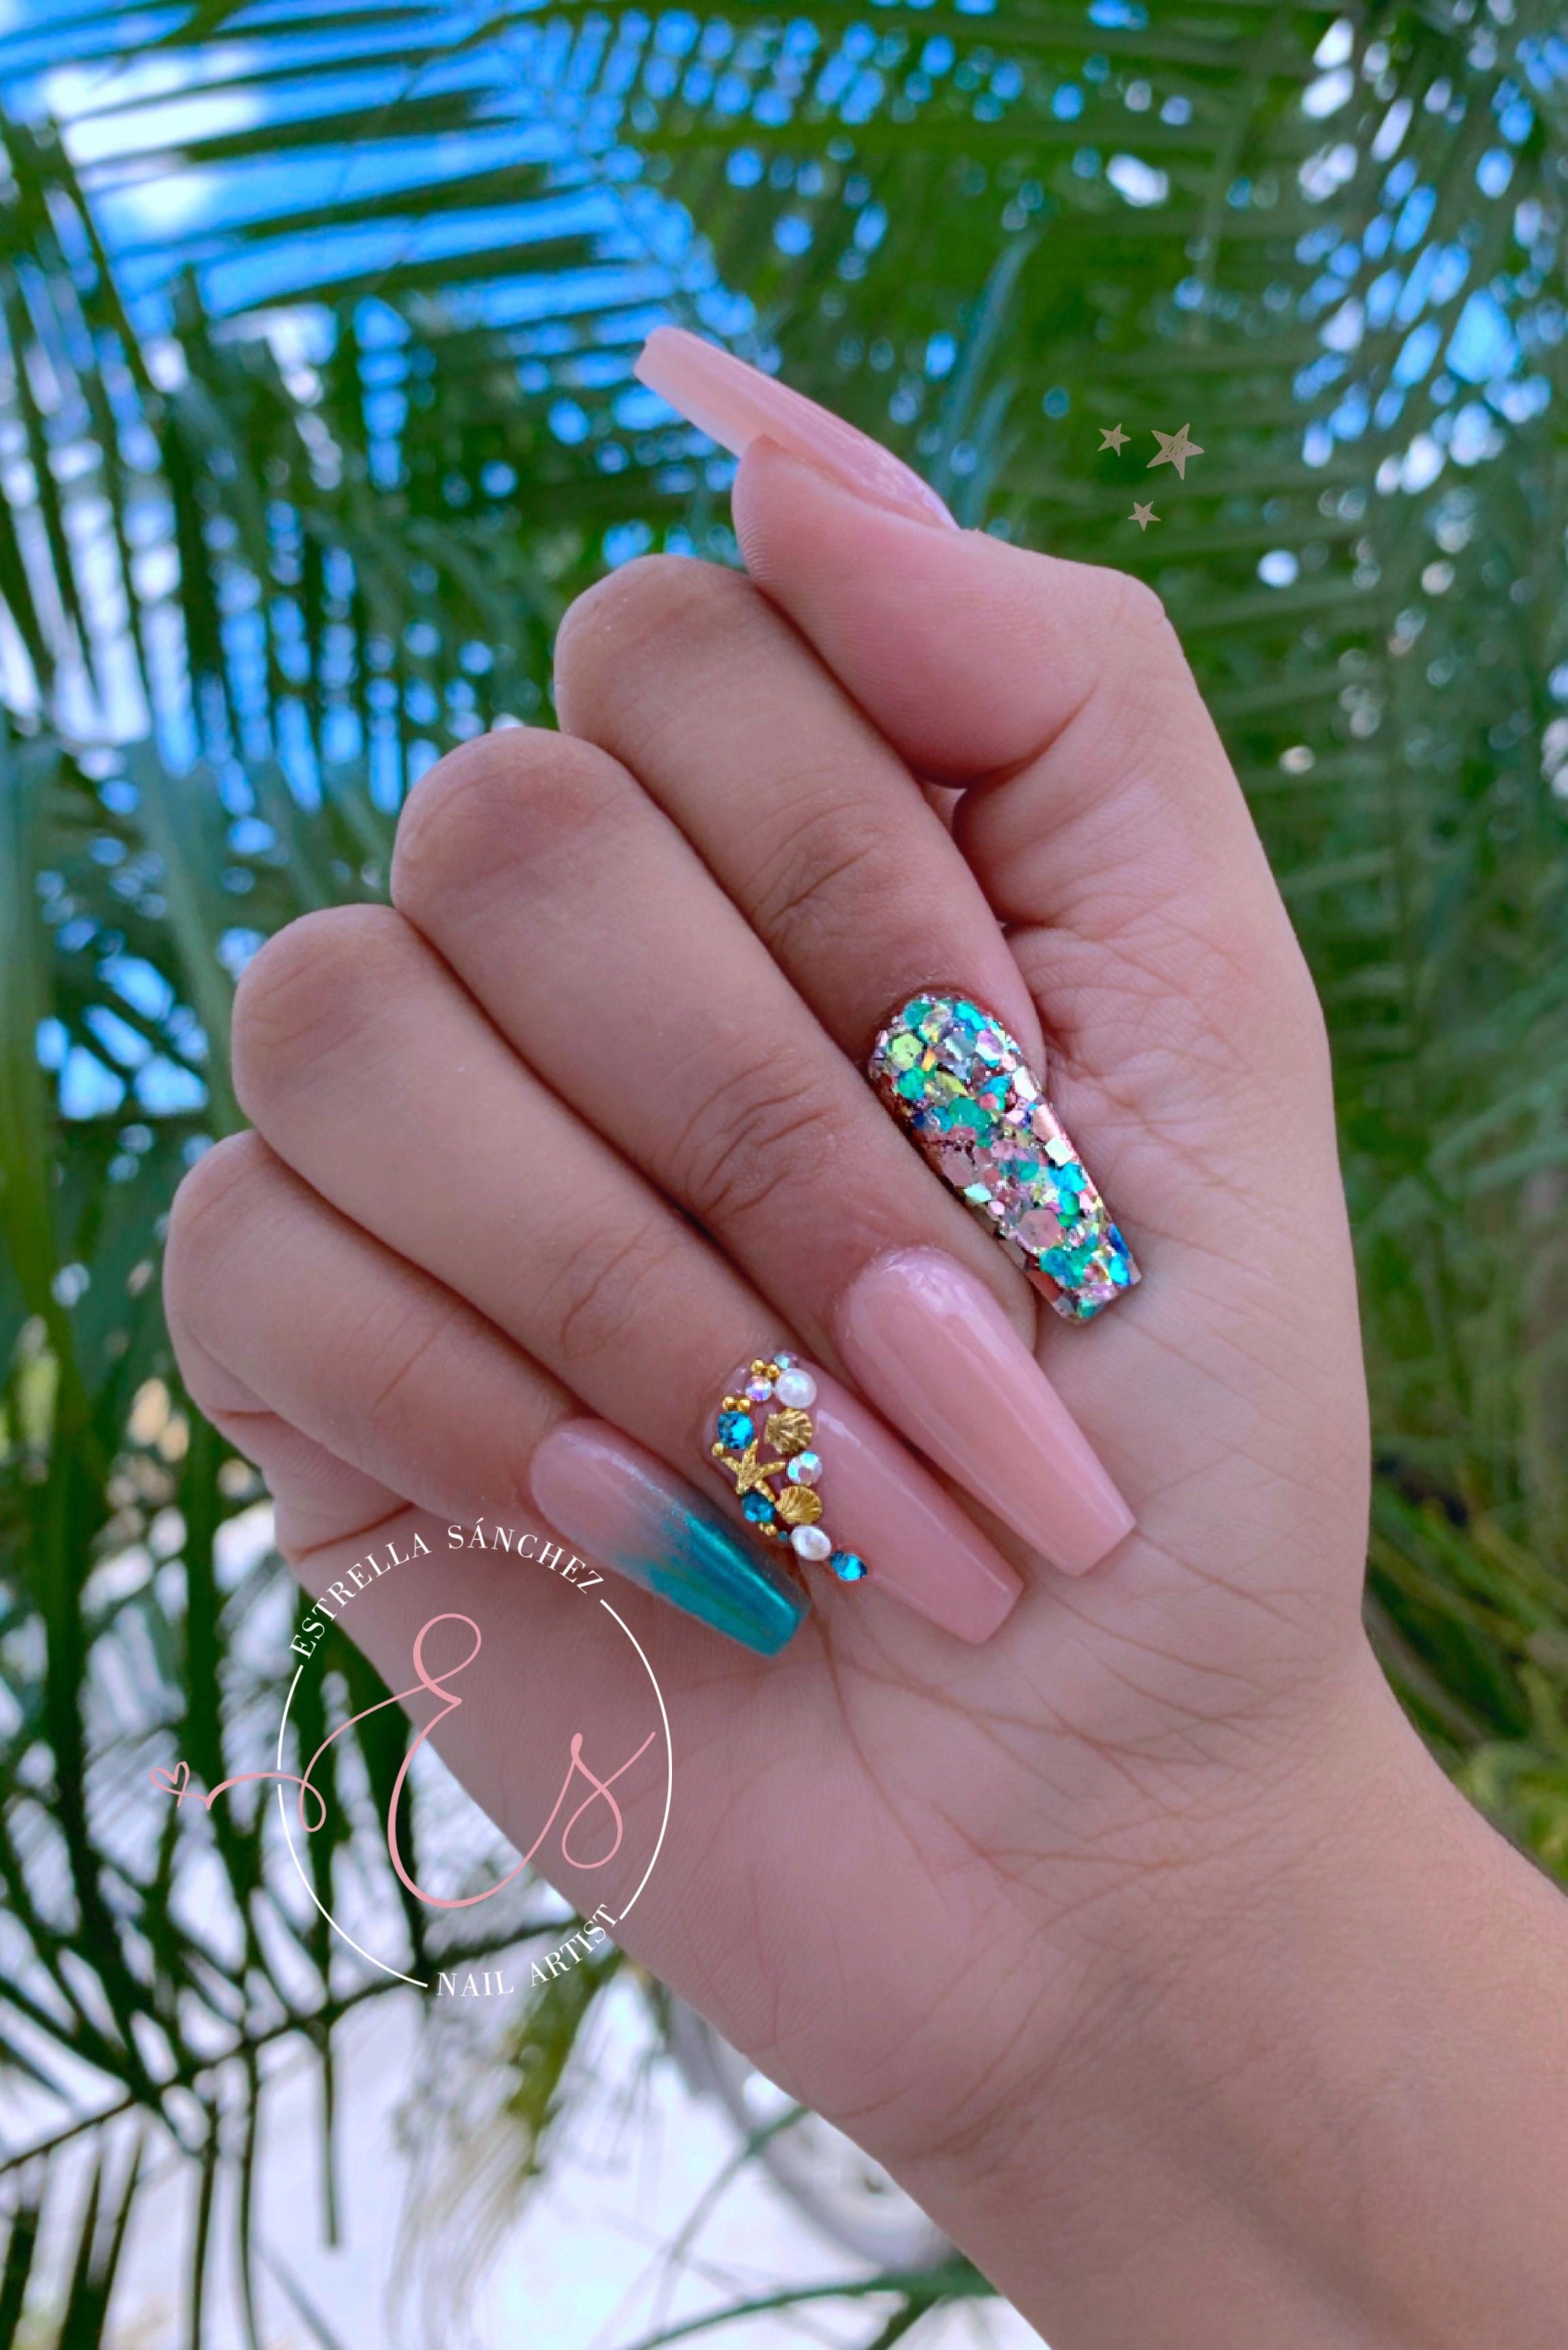 #nails #nailartdesigns #acrylicnails #turquoise #uñas #uñasdecoradas #summernails #summerstyle ...